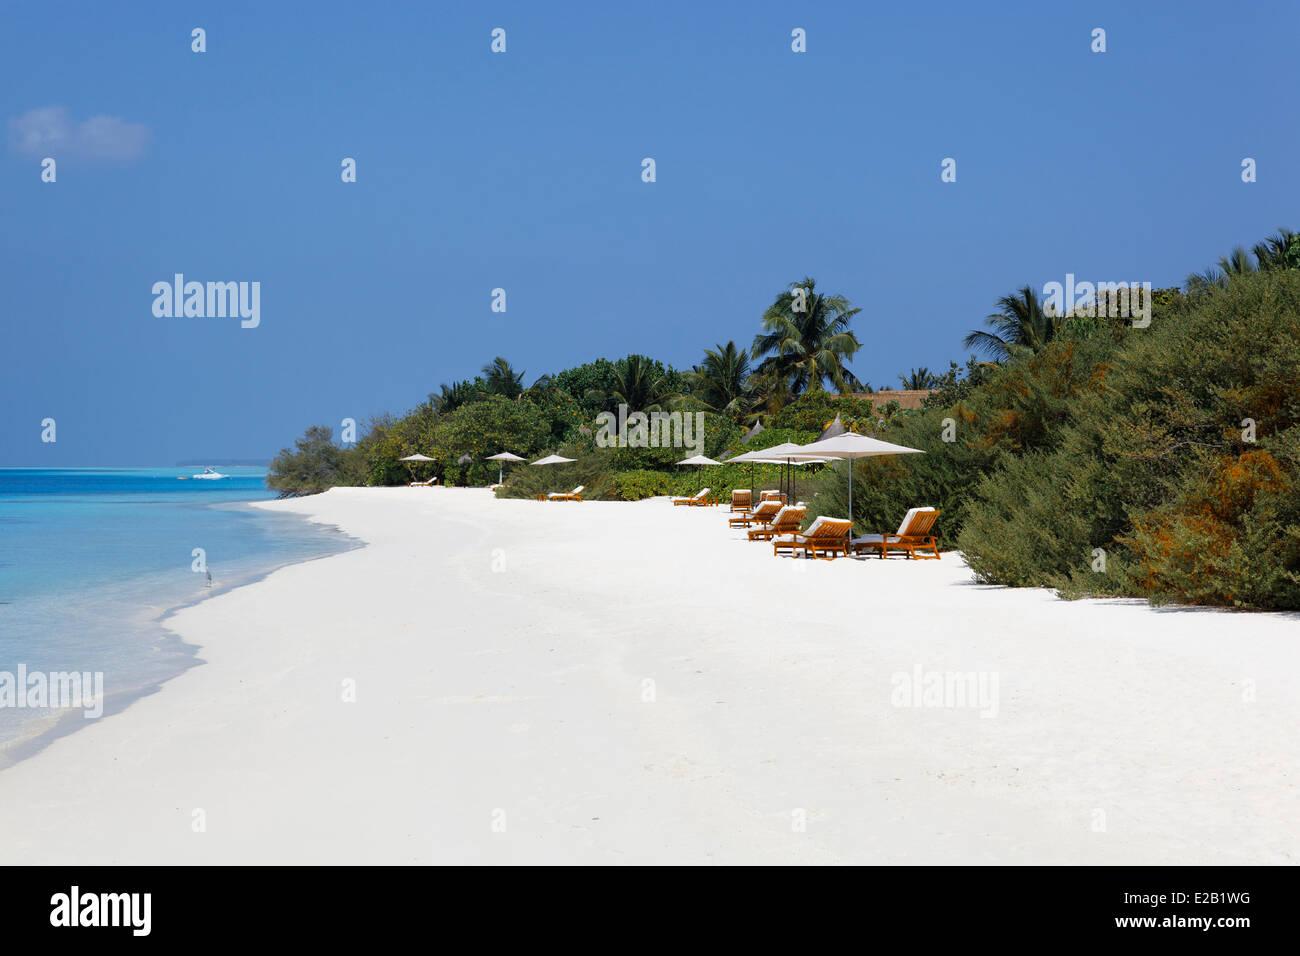 Maldives, Atoll Baa, Fours Seasons Landaa Giraavaru hotel - Stock Image